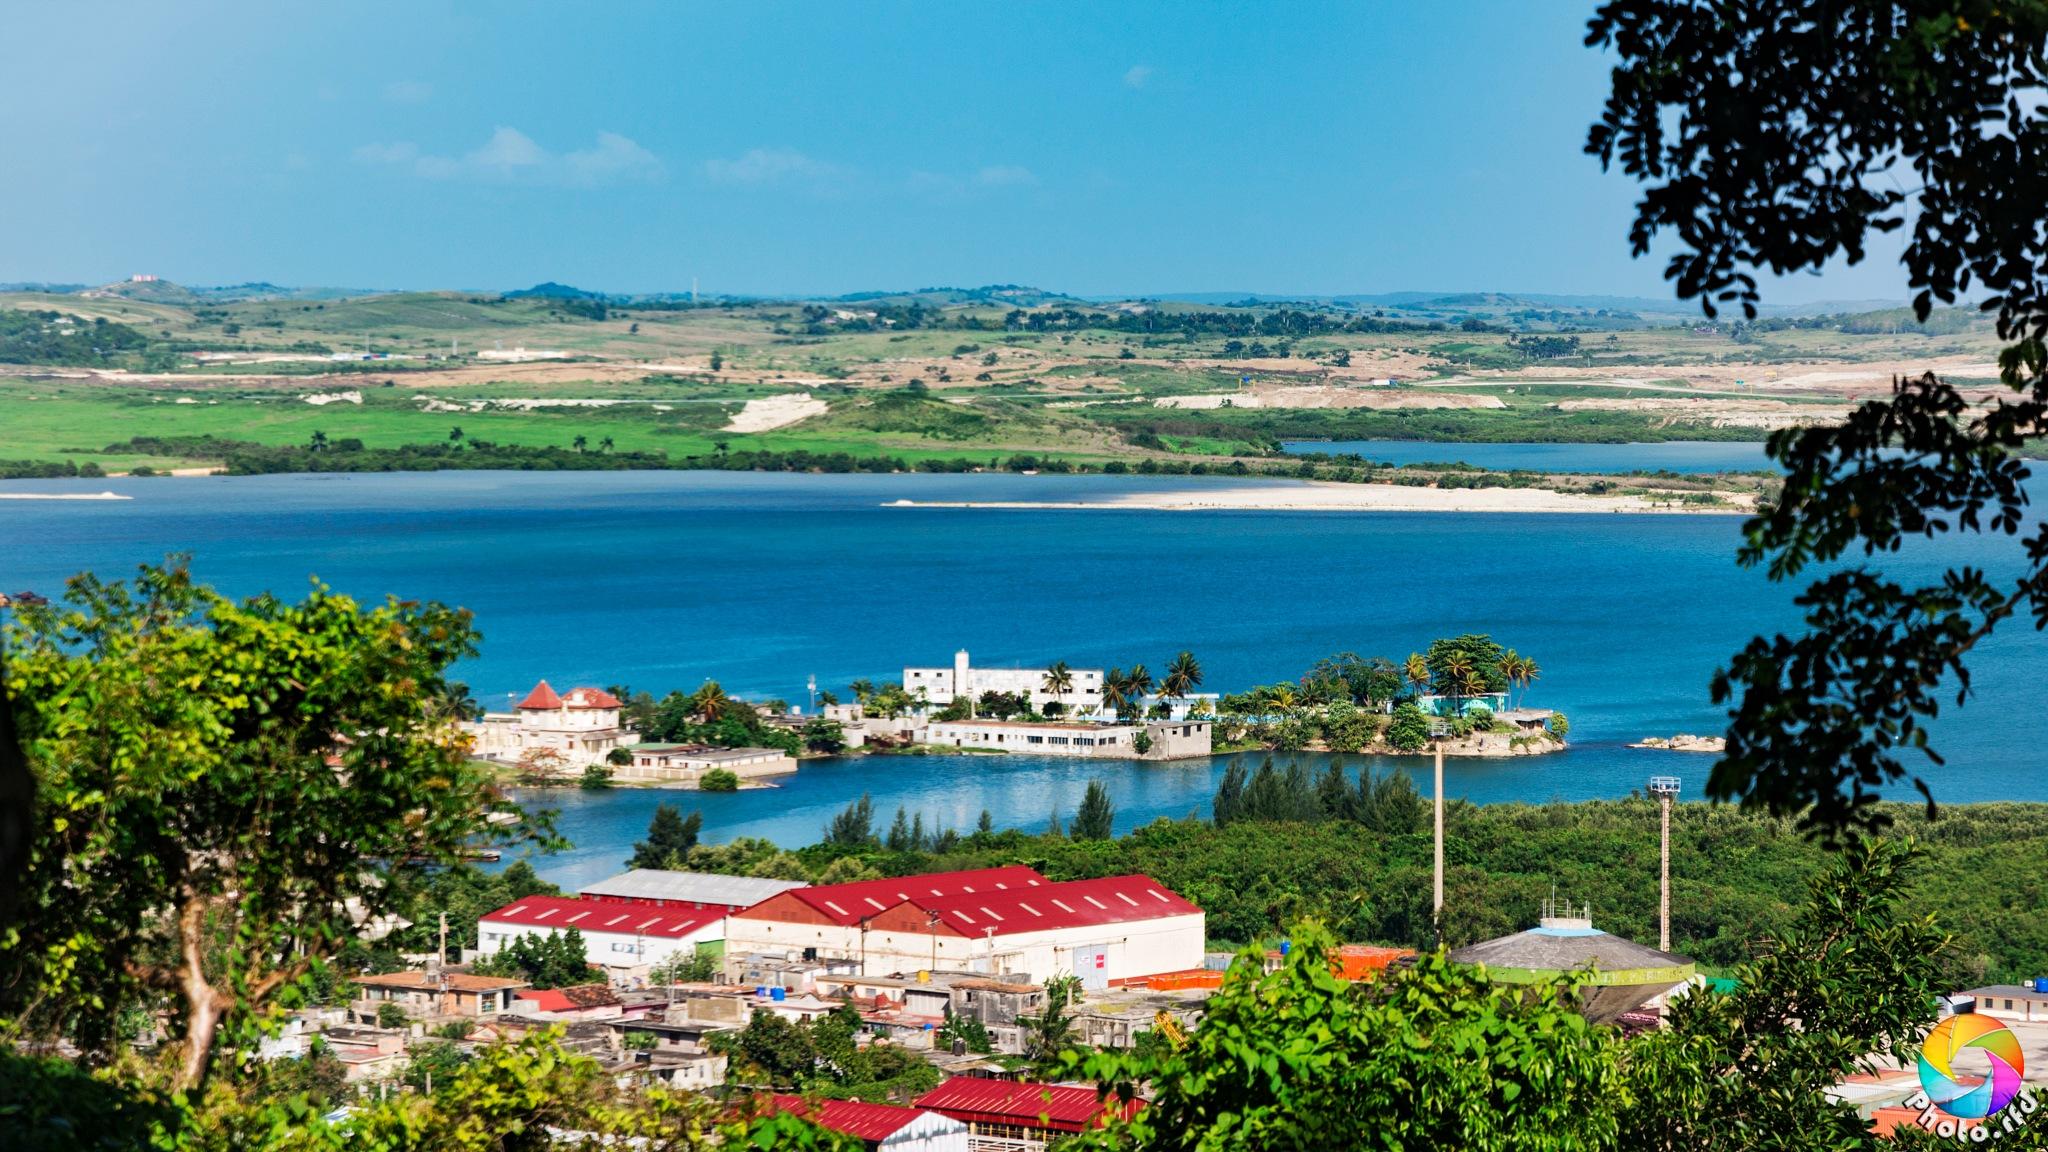 El Mariel Bay by Photo_rfd